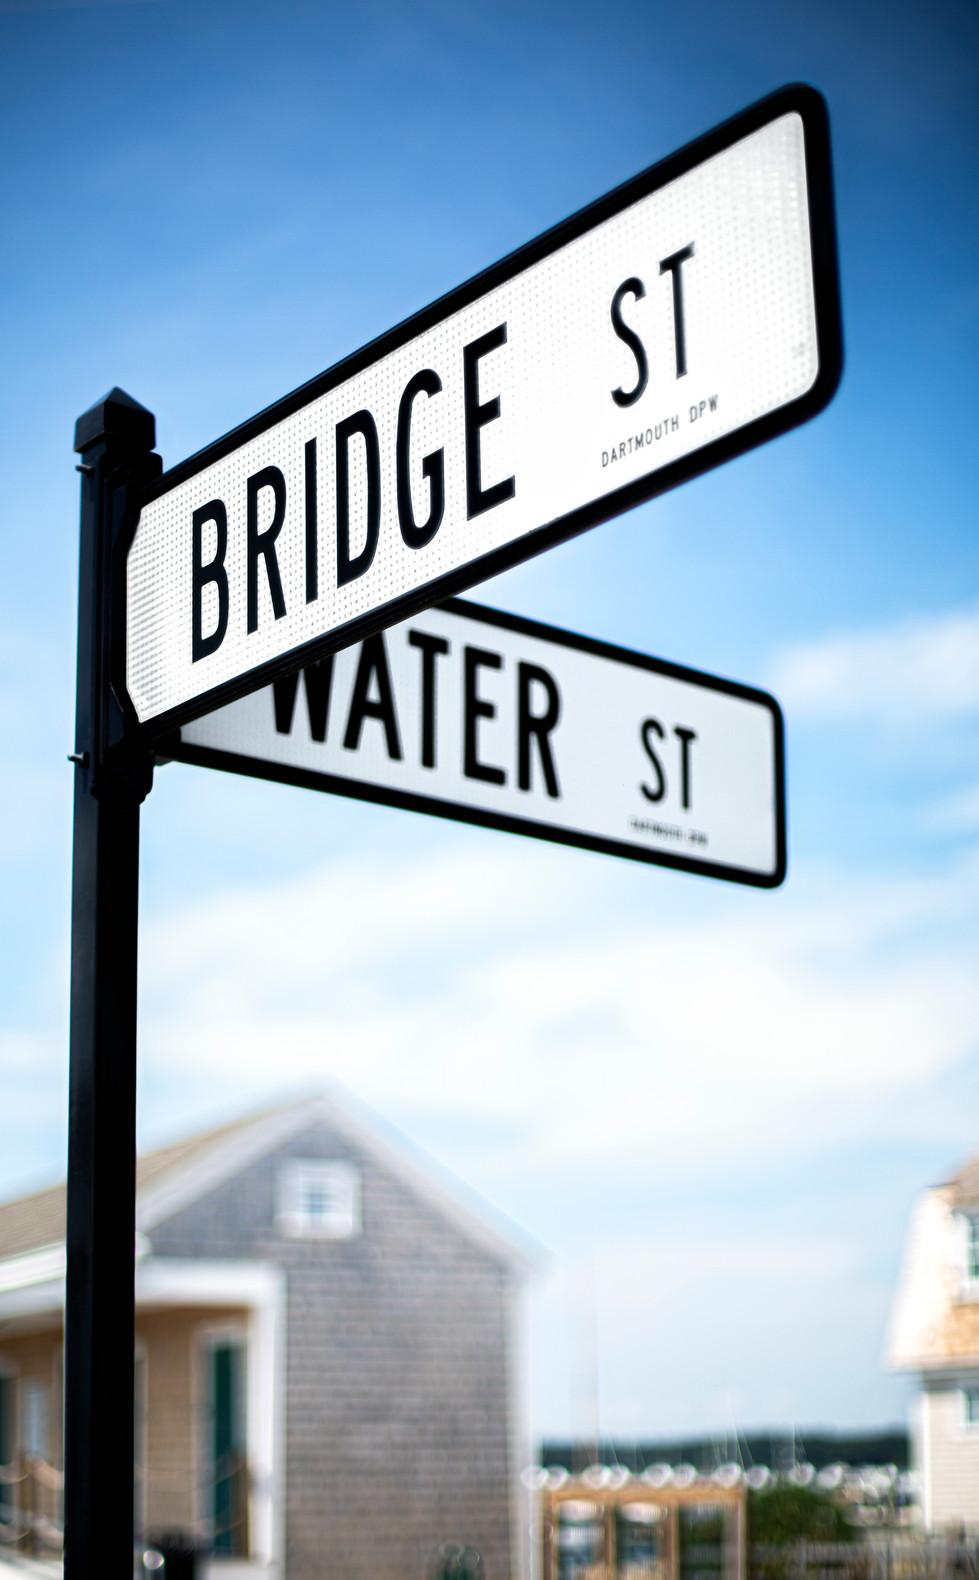 Bridge & Water Street.jpg